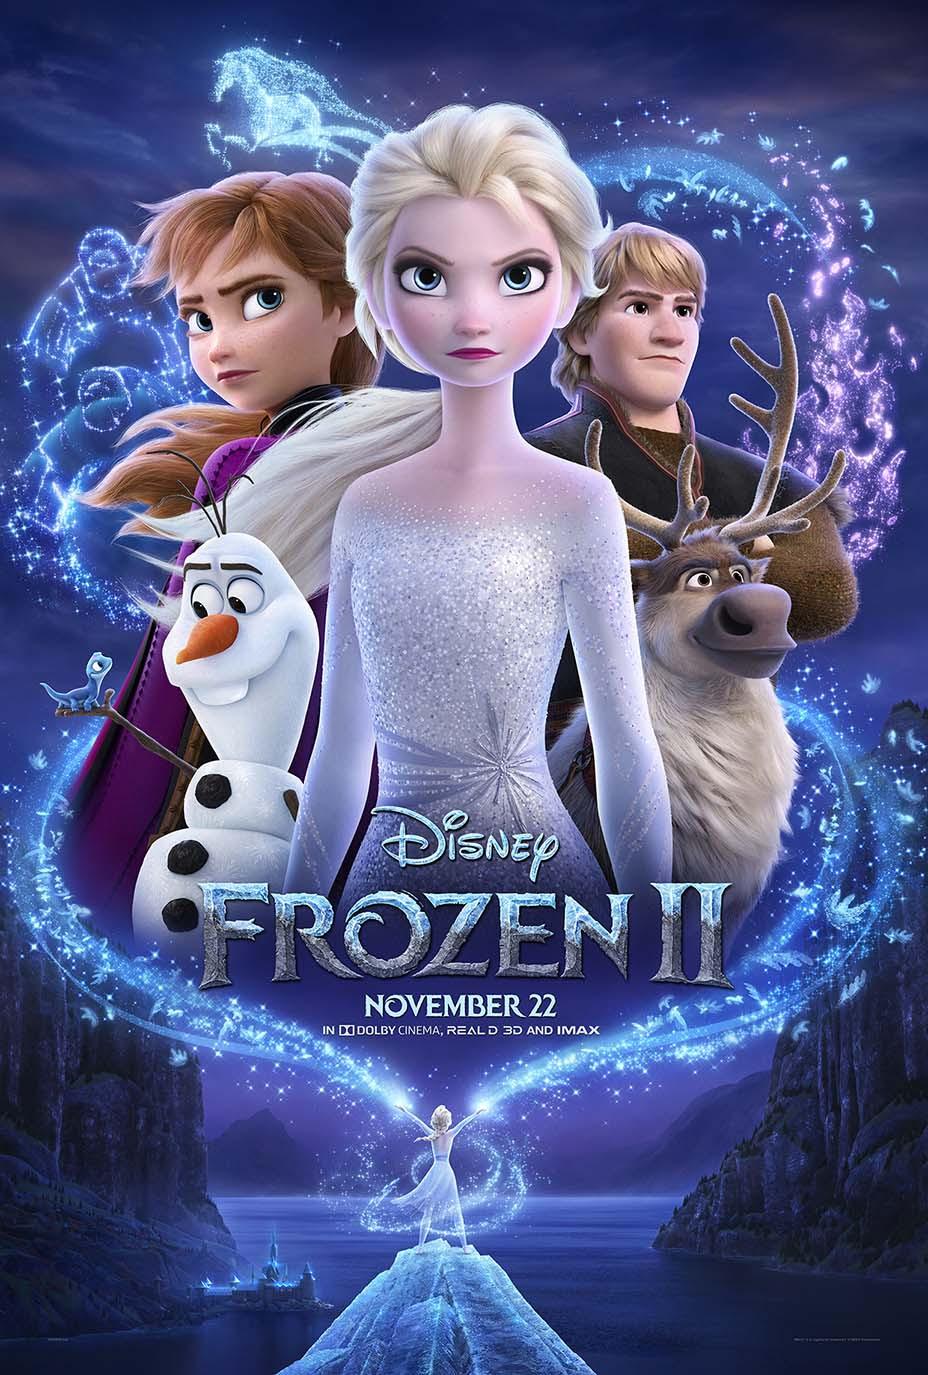 Movie Wallpaper Frozen 2 Wallpaper